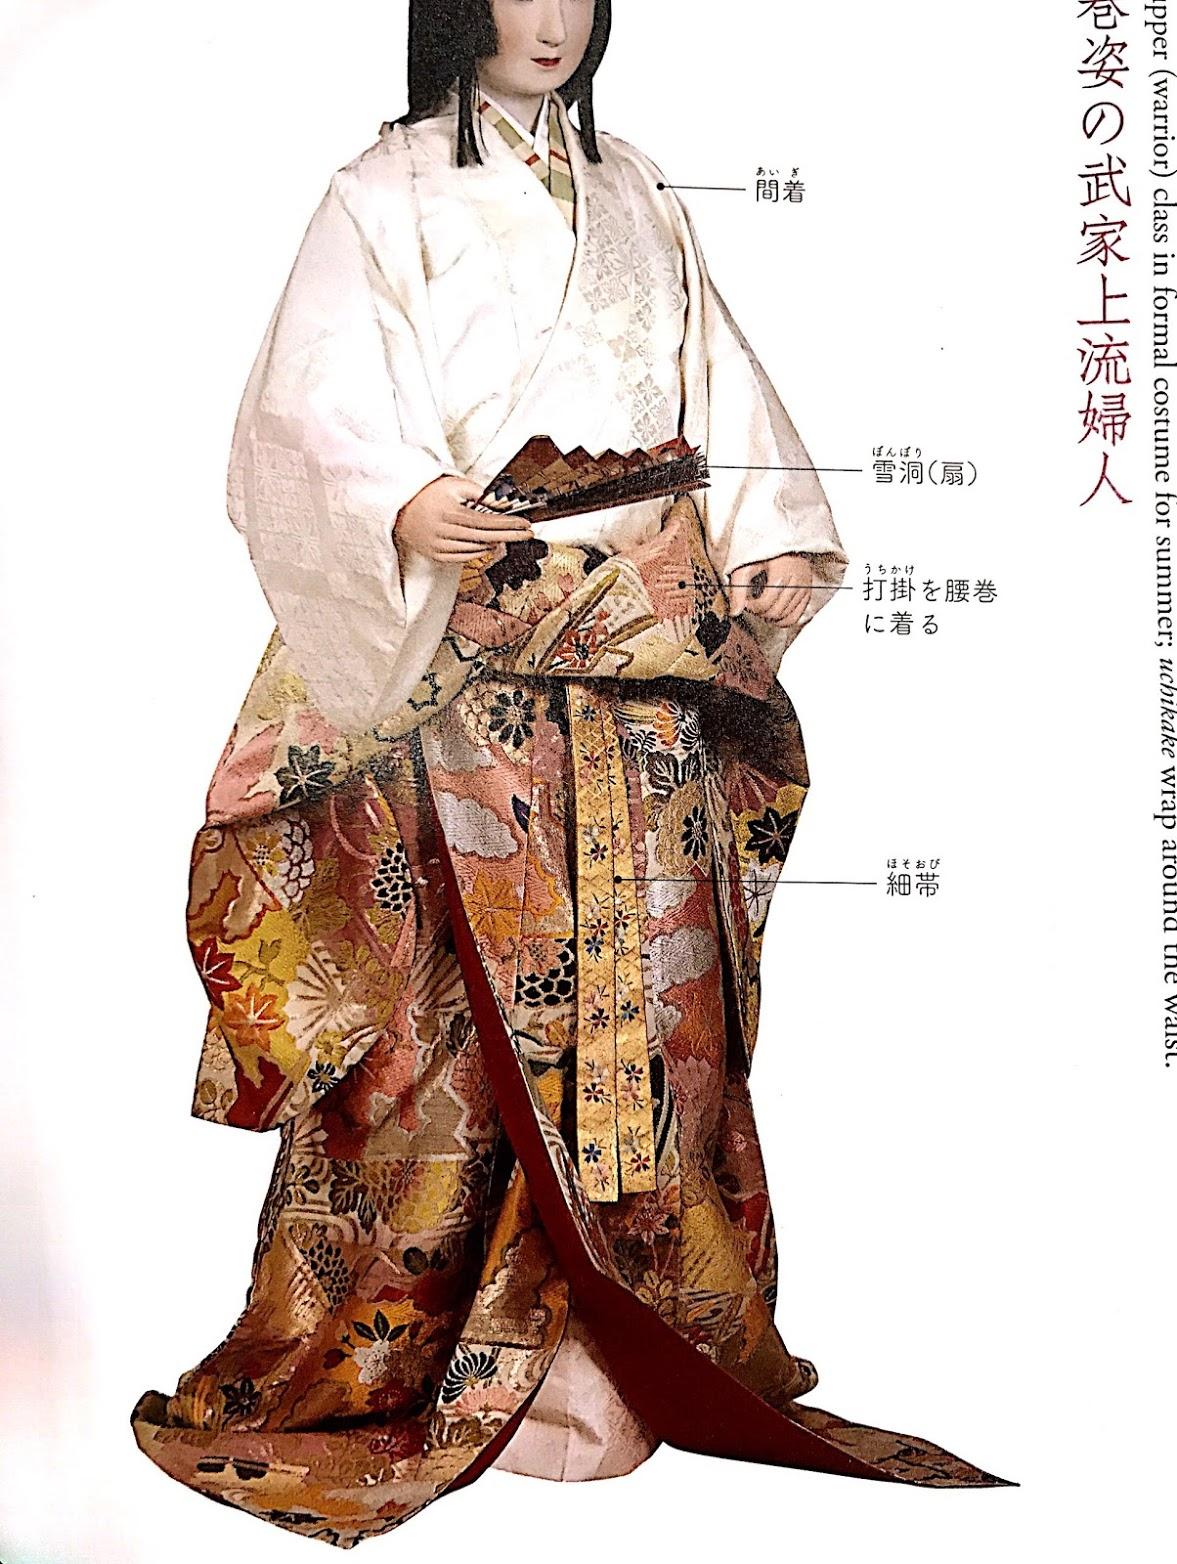 Research: Kimono Drape Reference